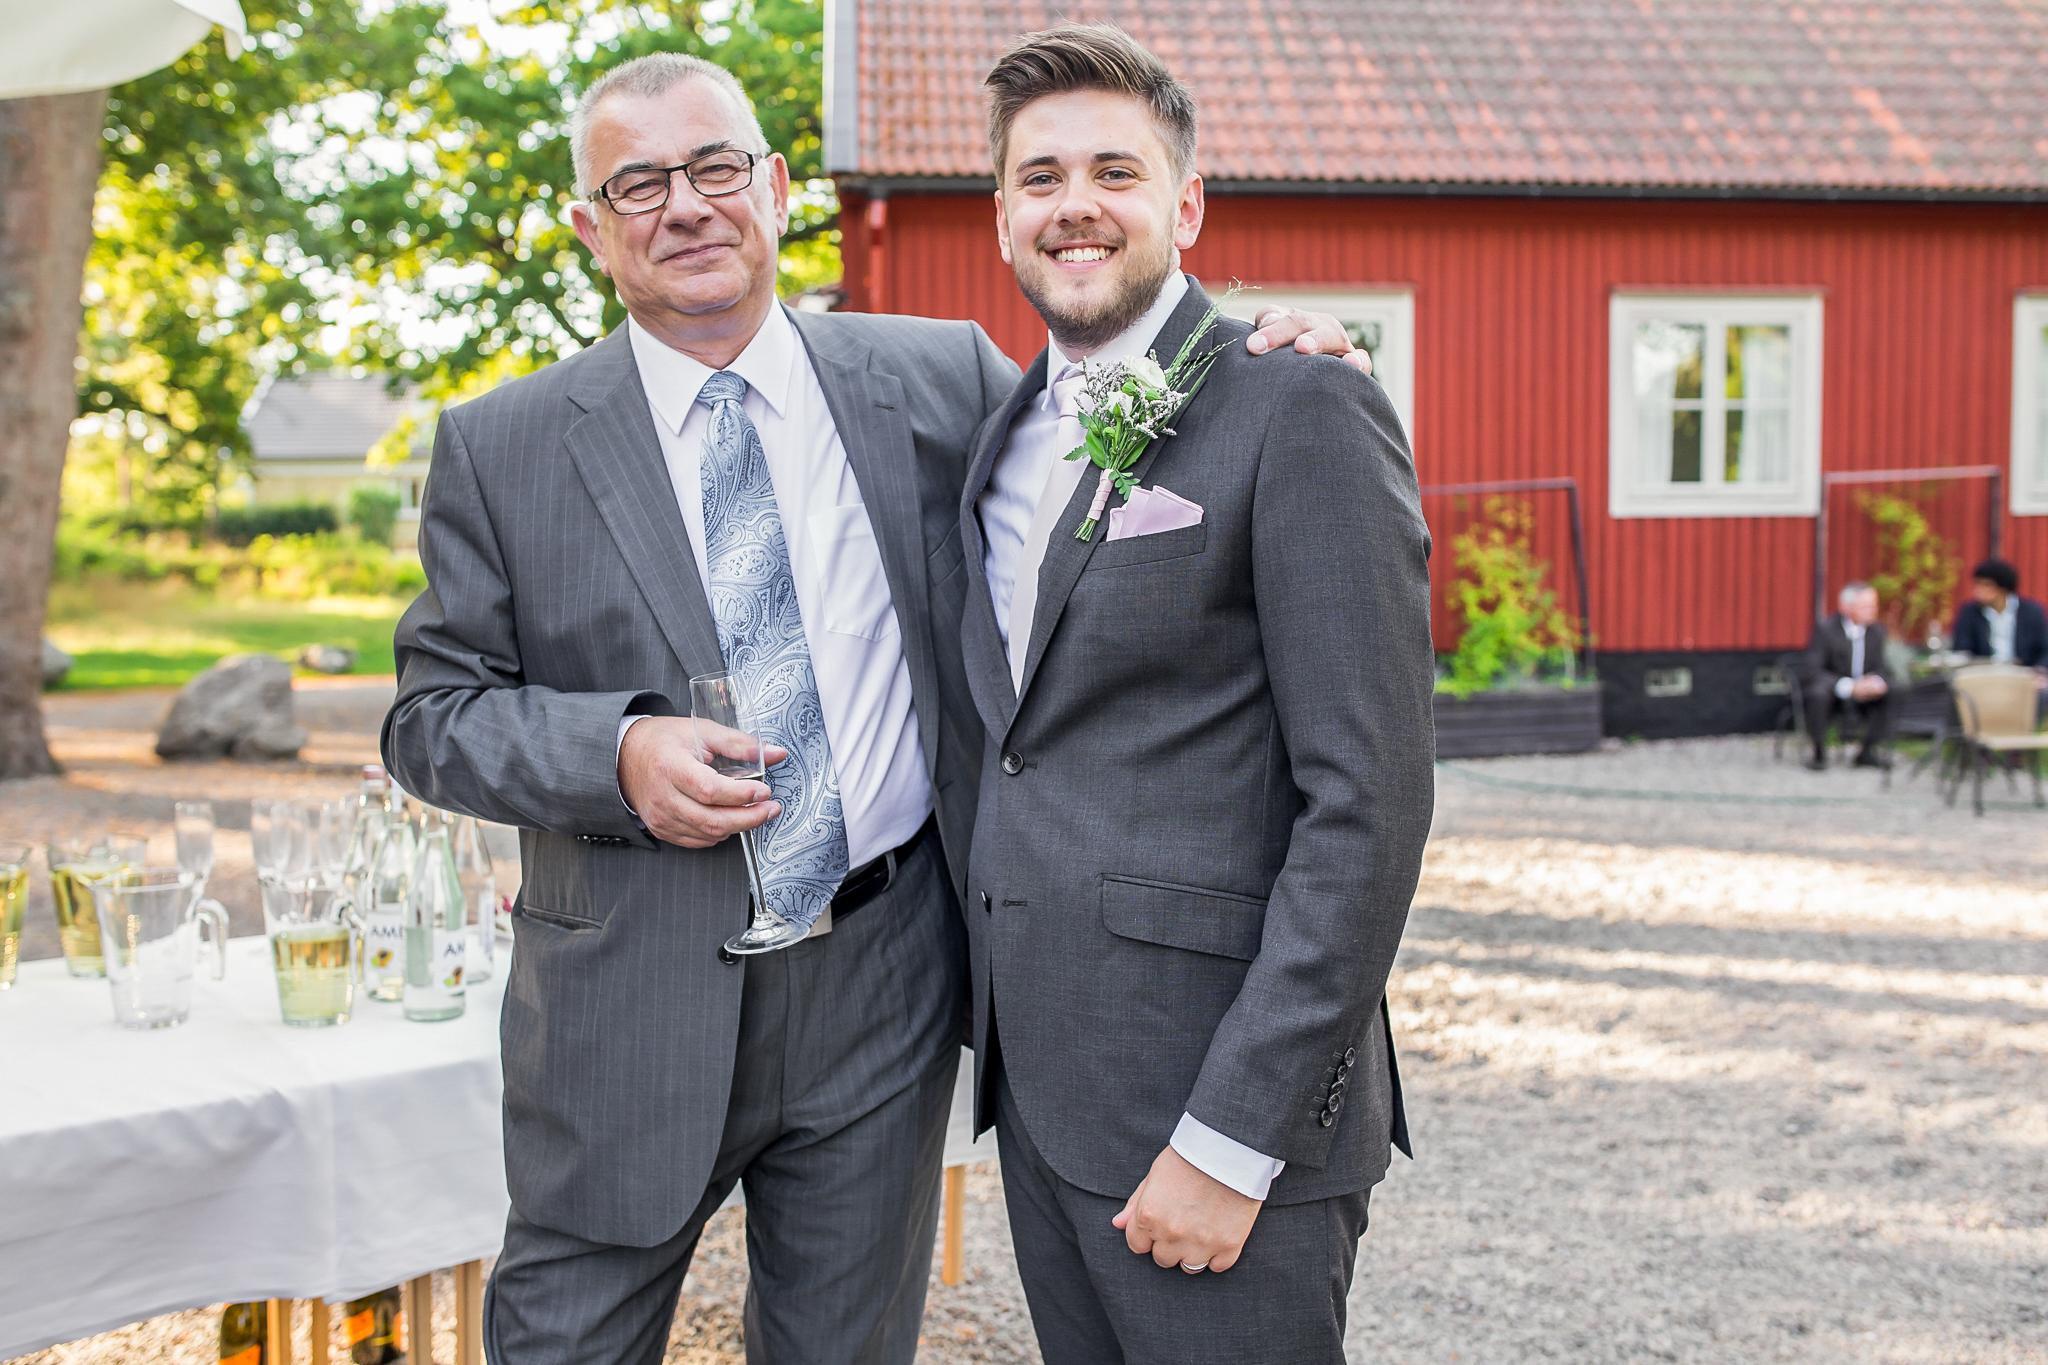 pj_brollopsfotograf_stockholm-276